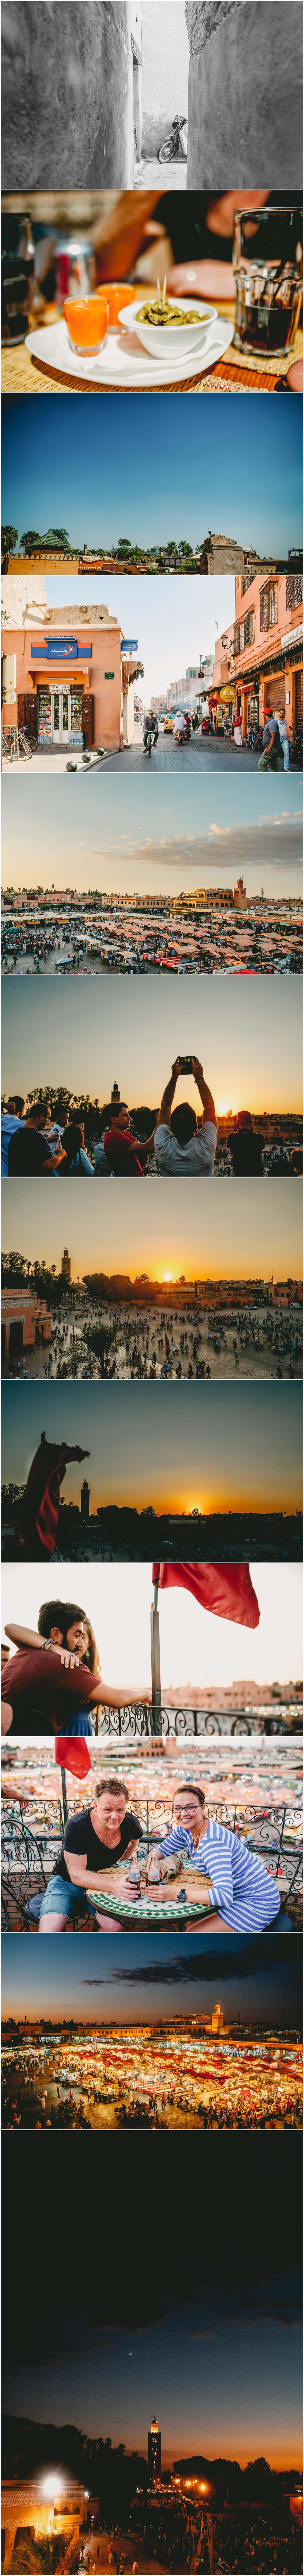 Marrakech, Morocco, street photography, travel photography, Lisa Carpenter Photography, West Midlands